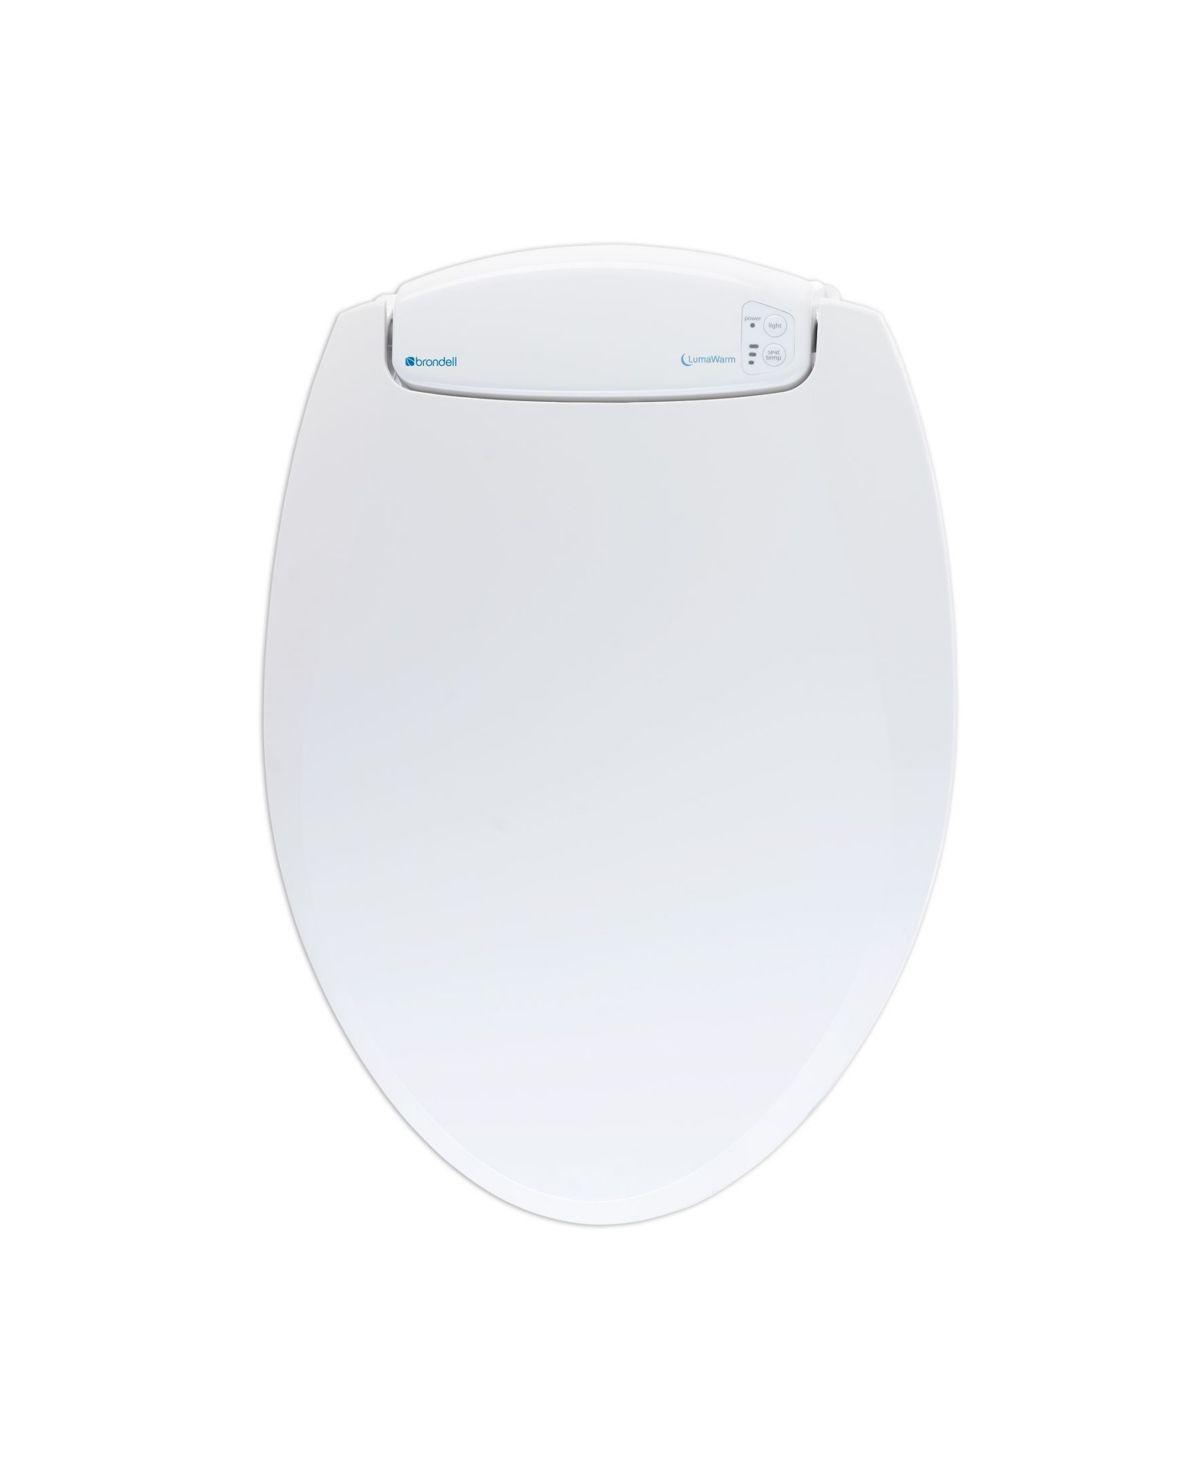 Brondell Lumawarm Heated Nightlight Toilet Seat Elongated White